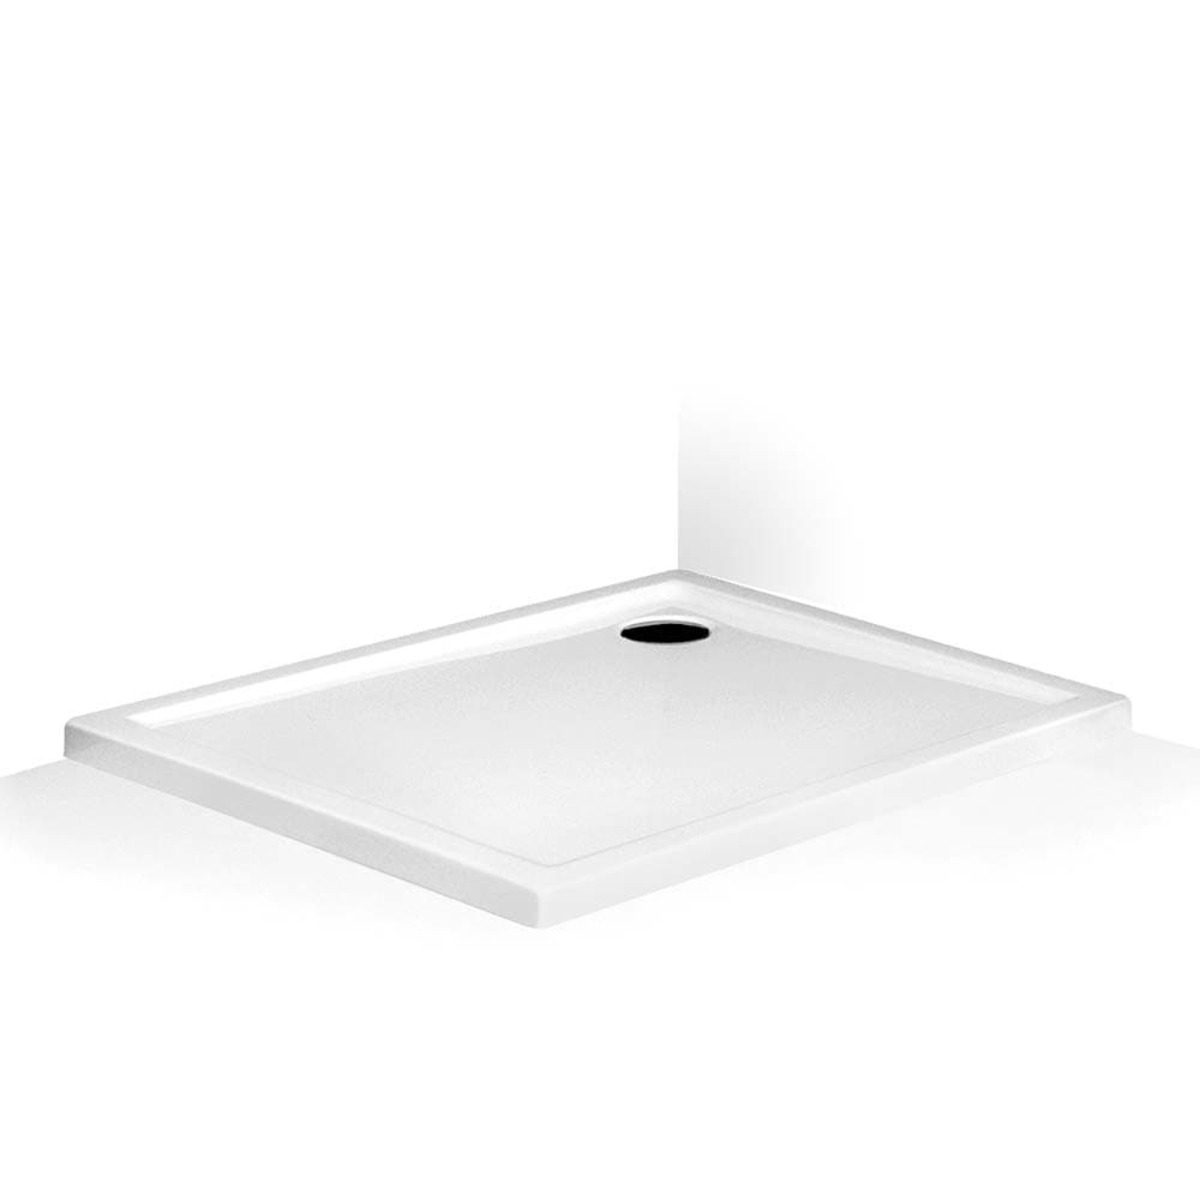 Sprchová vanička obdélníková Roth 150x90 cm akrylát 8000255